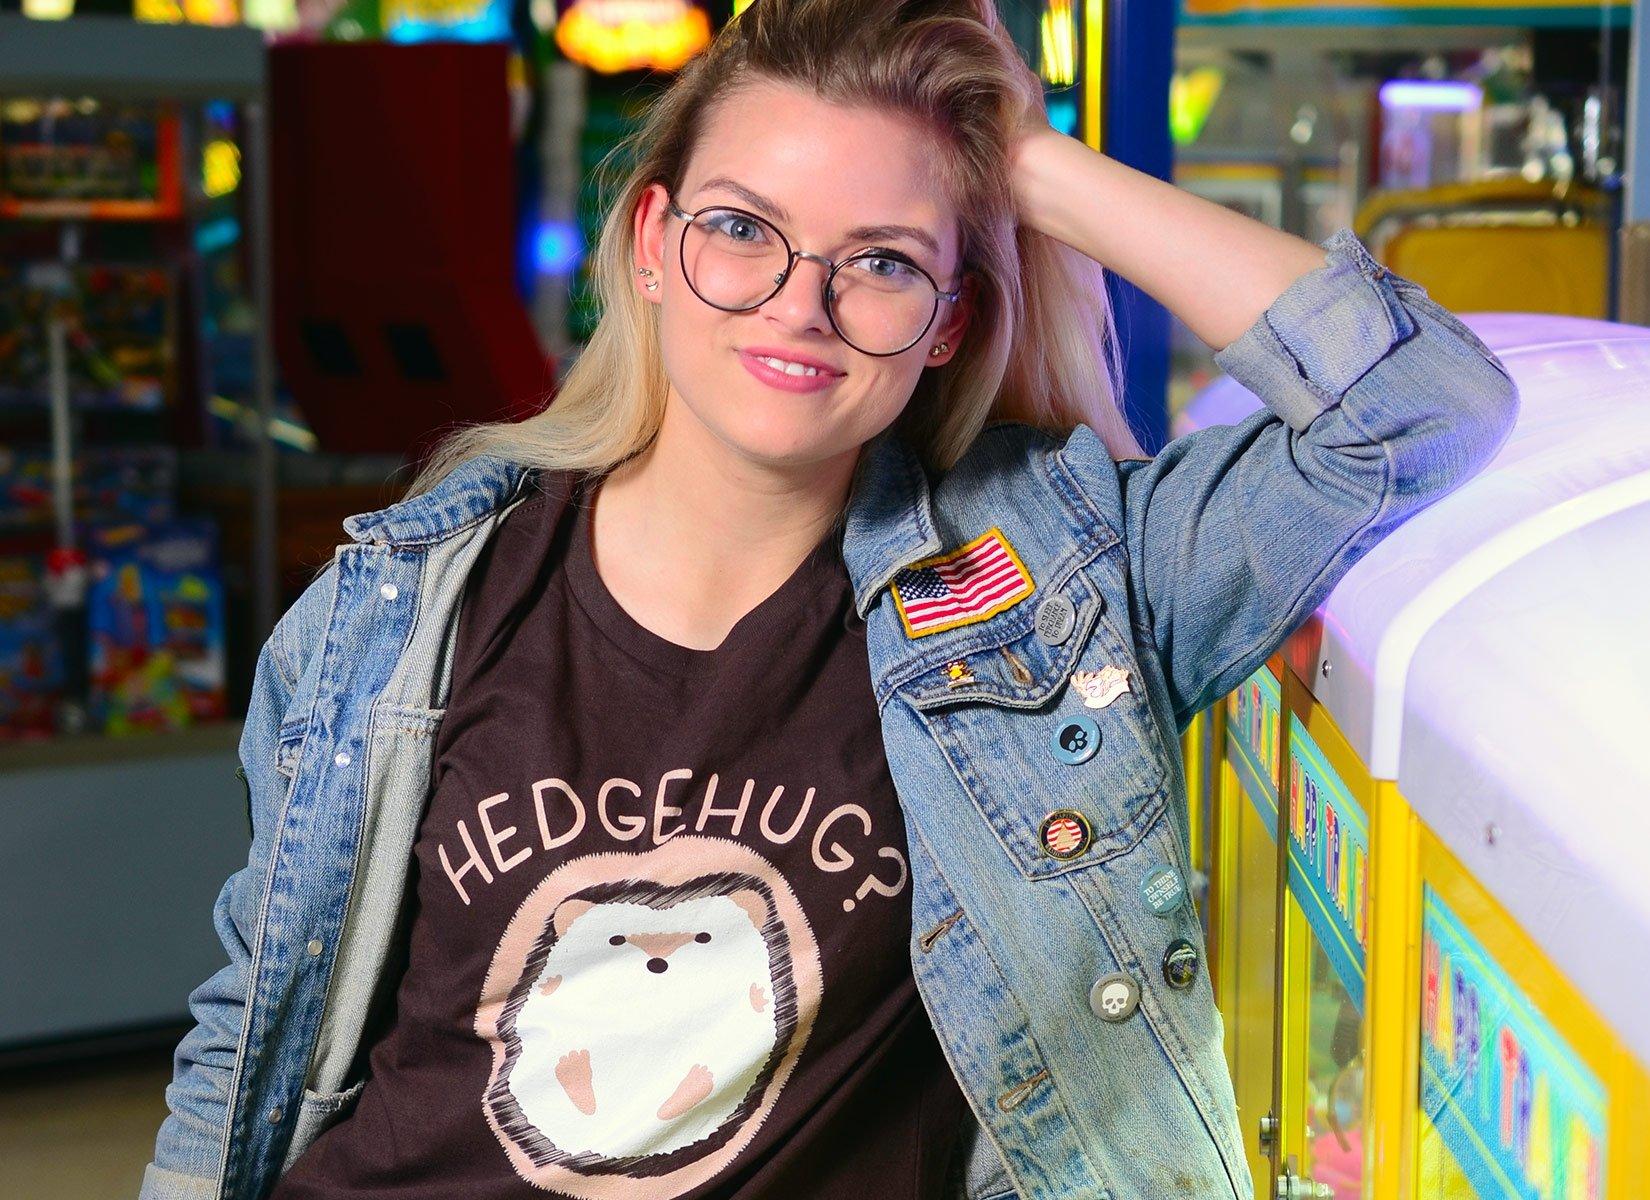 Hedgehug on Womens T-Shirt